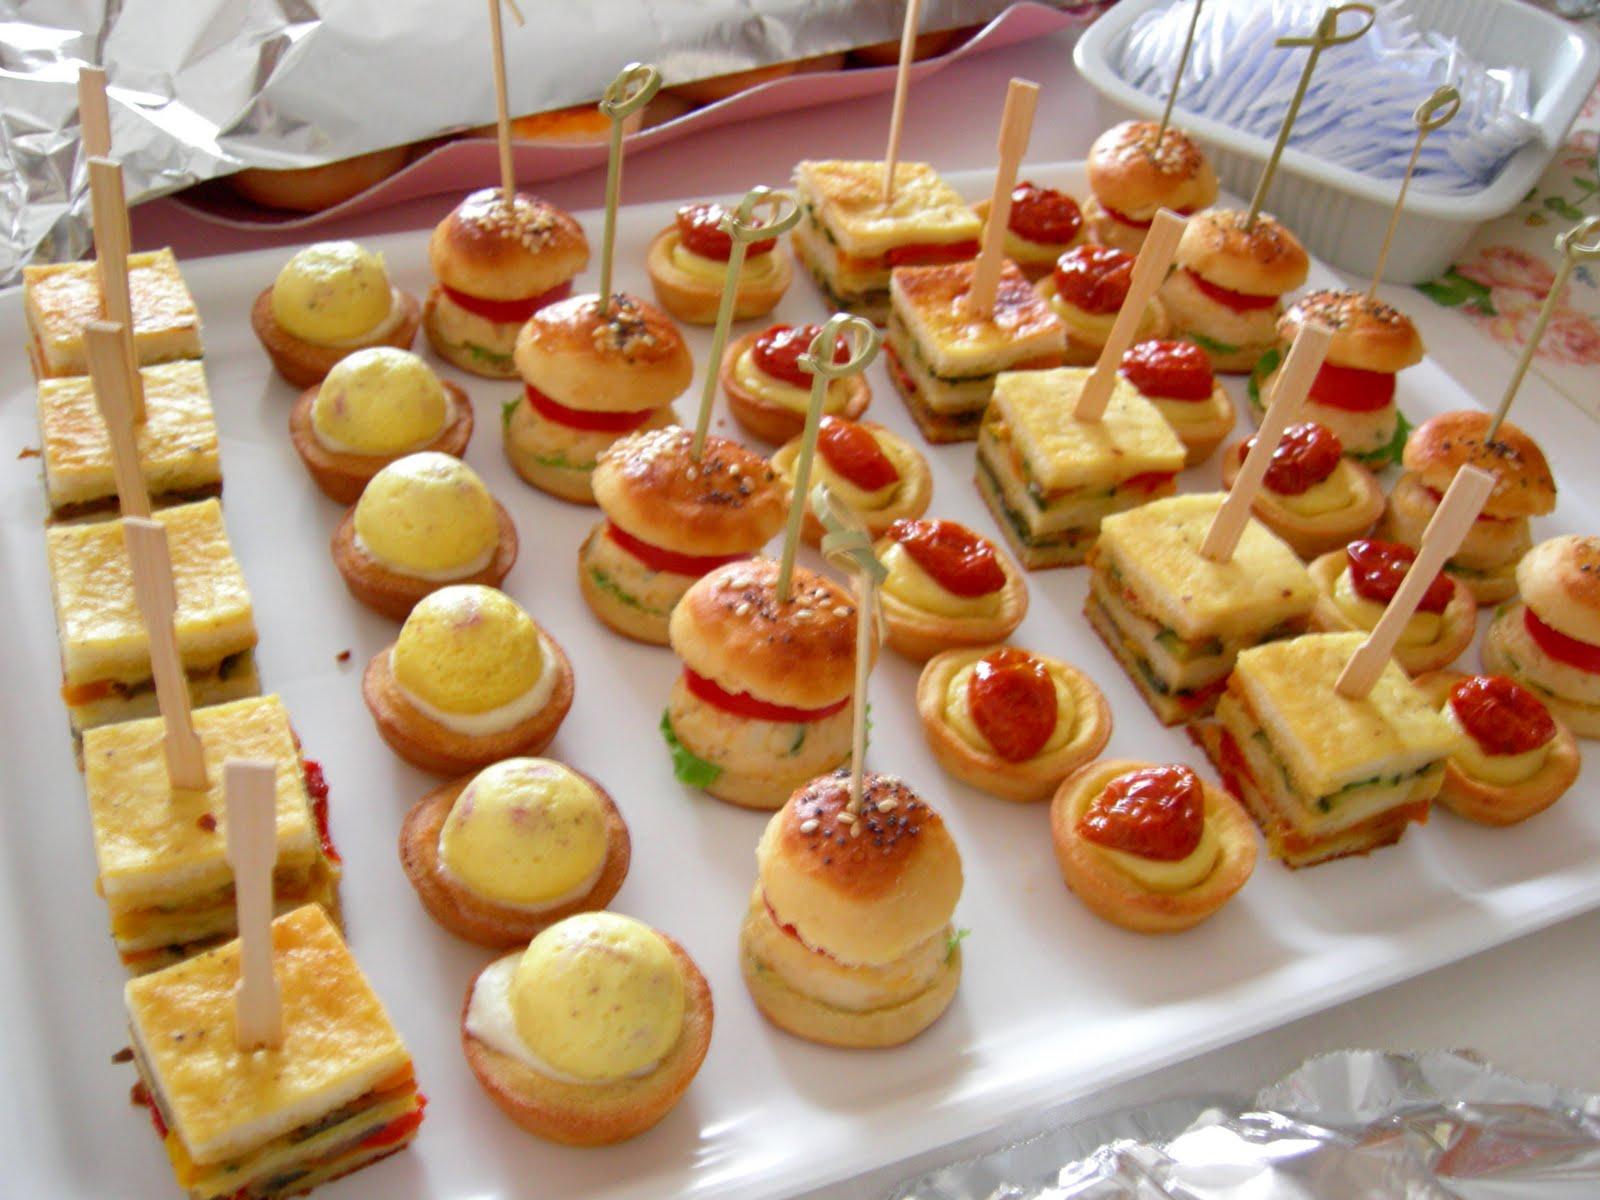 Pranzo A Buffet Per Compleanno : Pasqualina in cucina buffet per il mio compleanno